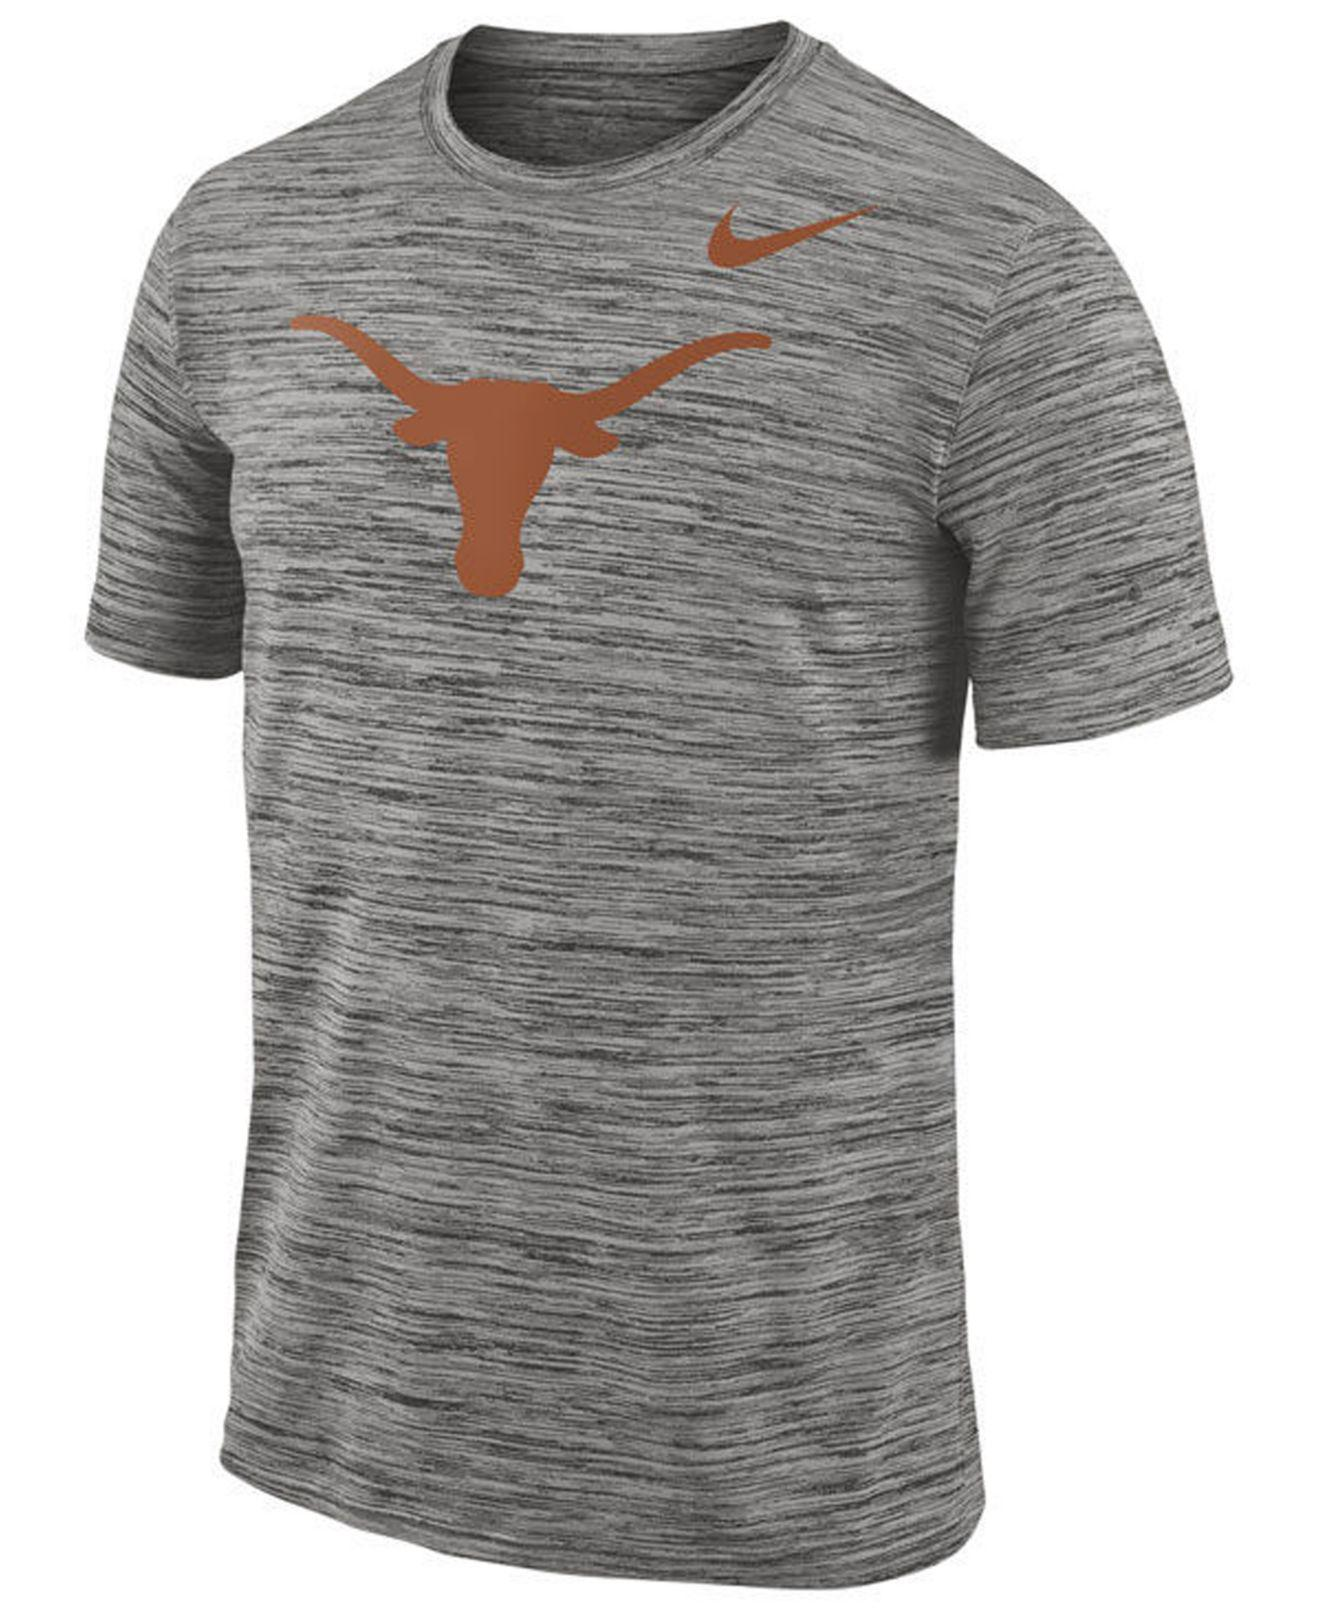 5017c2eb3d8f Lyst - Nike Texas Longhorns Legend Travel T-shirt in Gray for Men